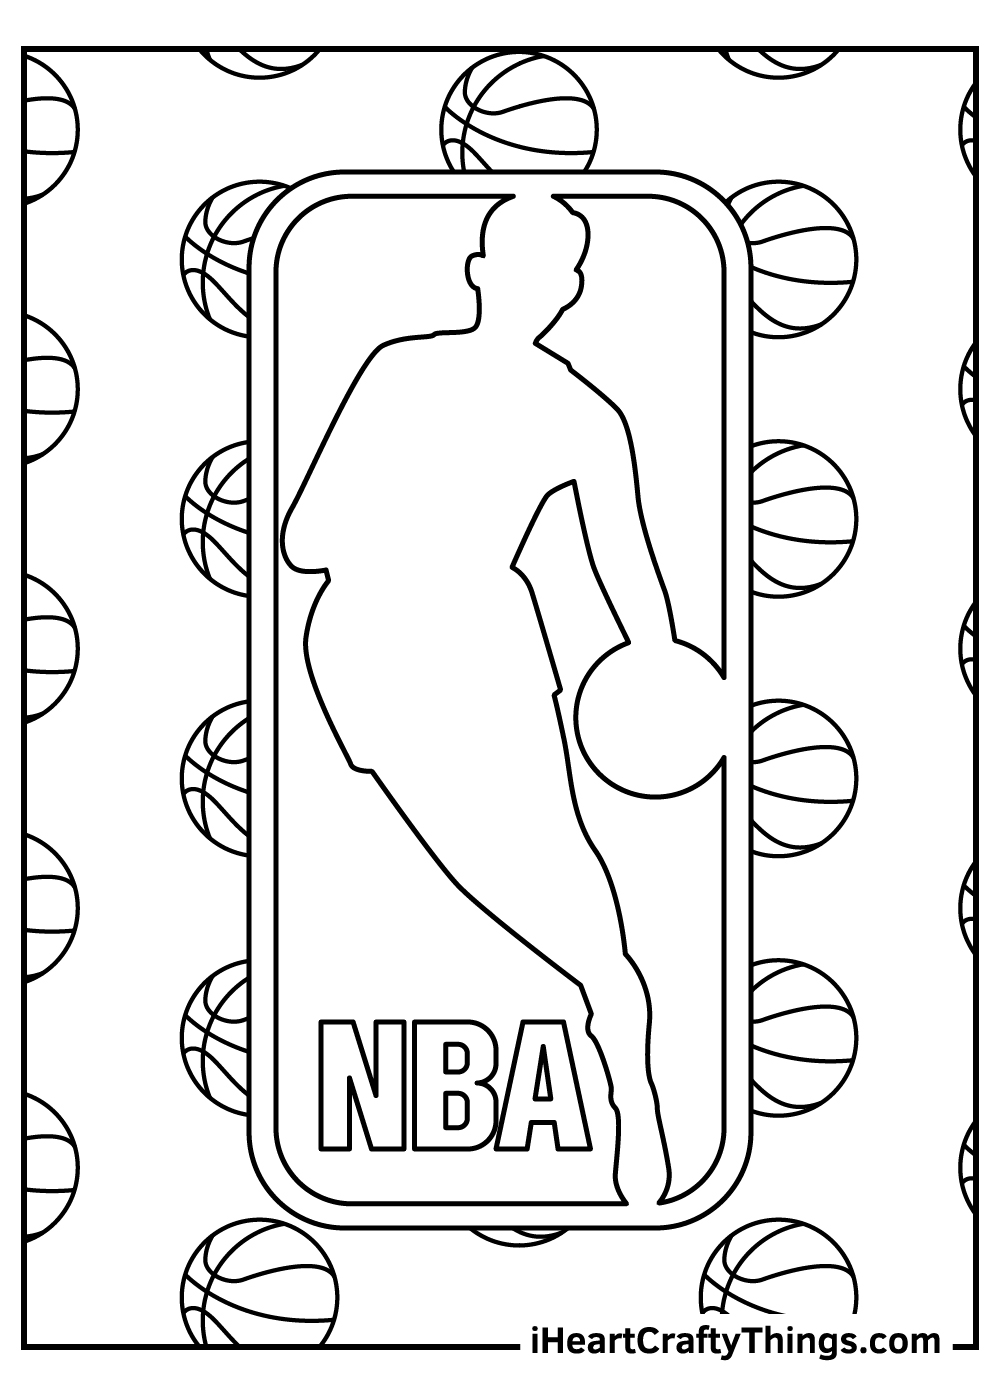 NBA coloring pages logo free printable